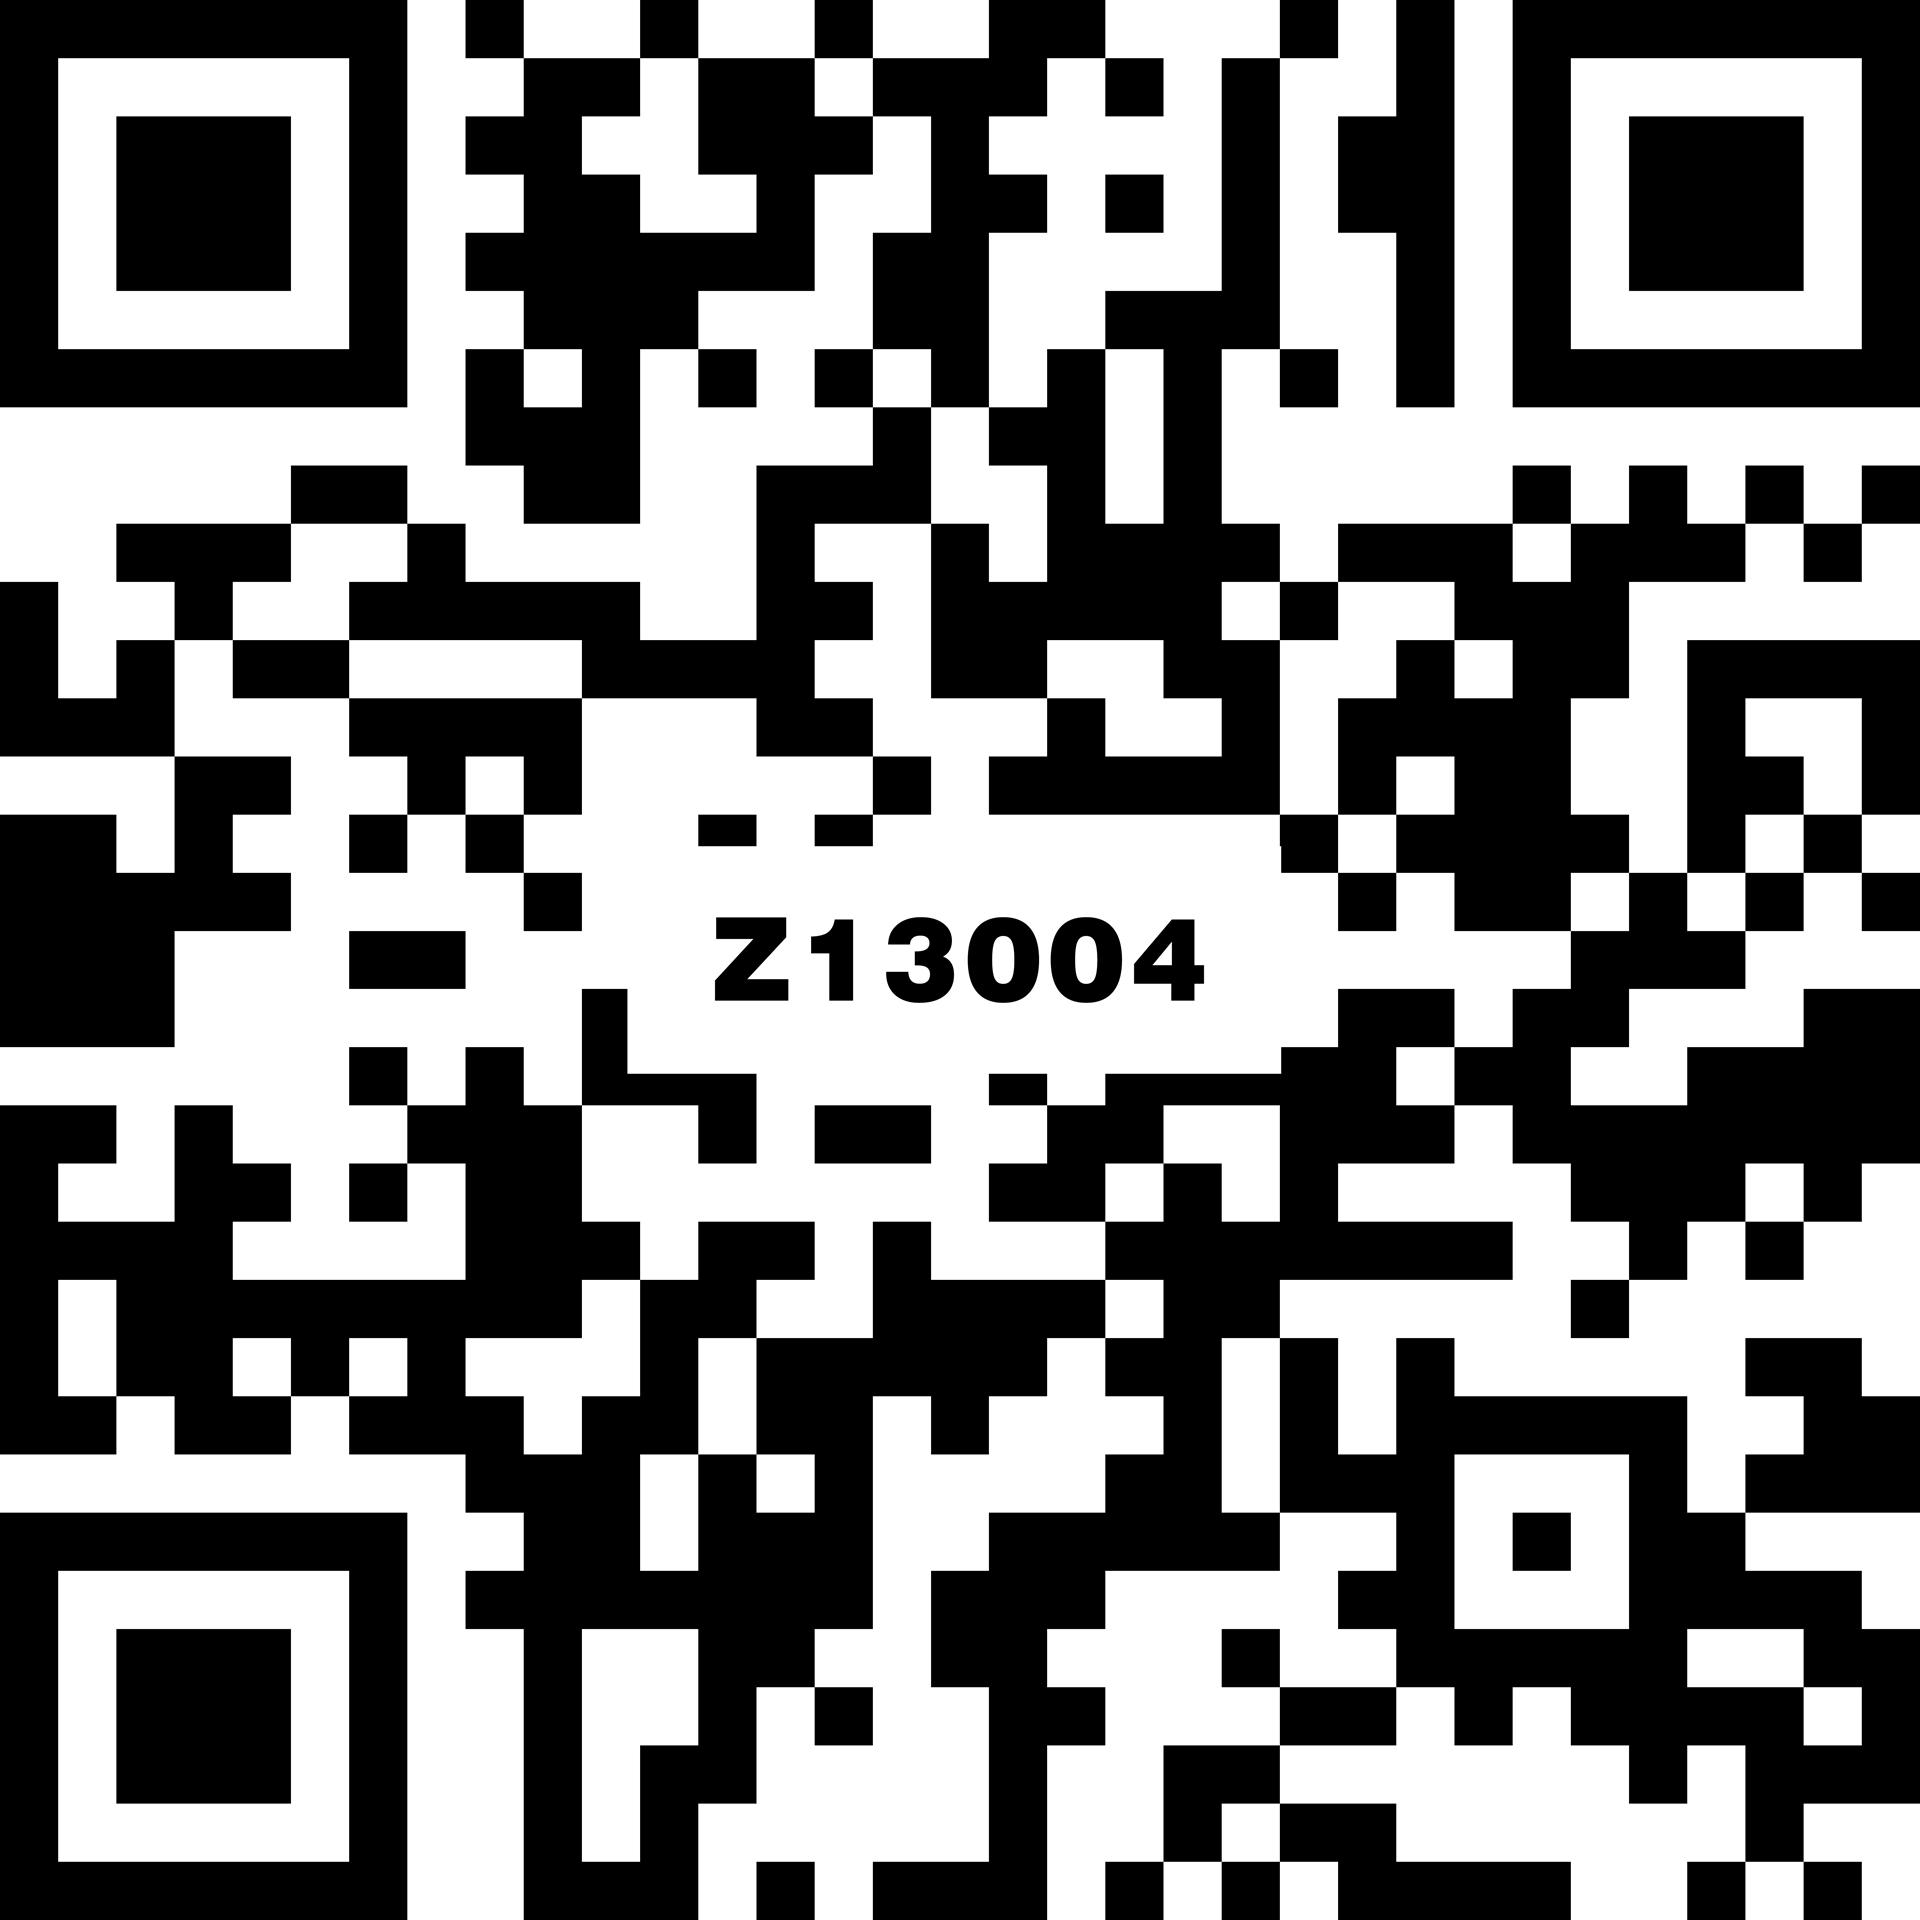 Z13004